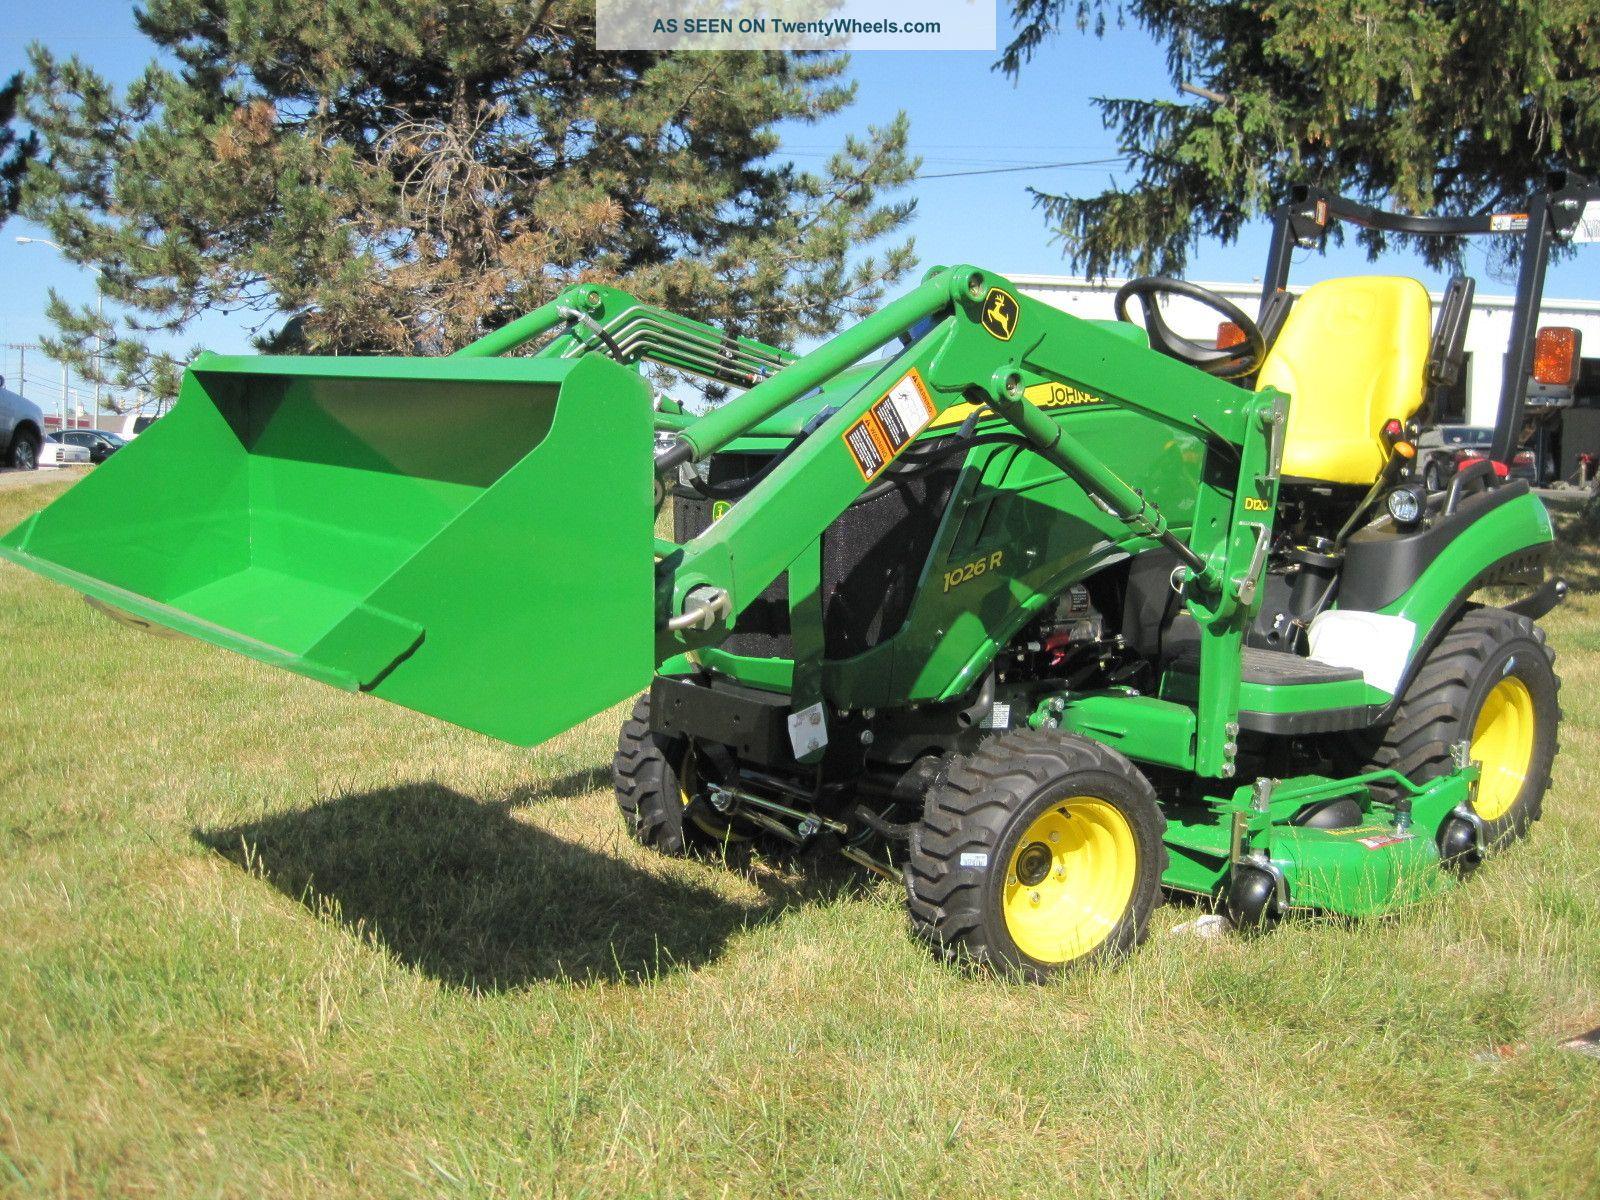 John Deere 1026r Loader Snow Plow : New john deere series r sub compact tractor with